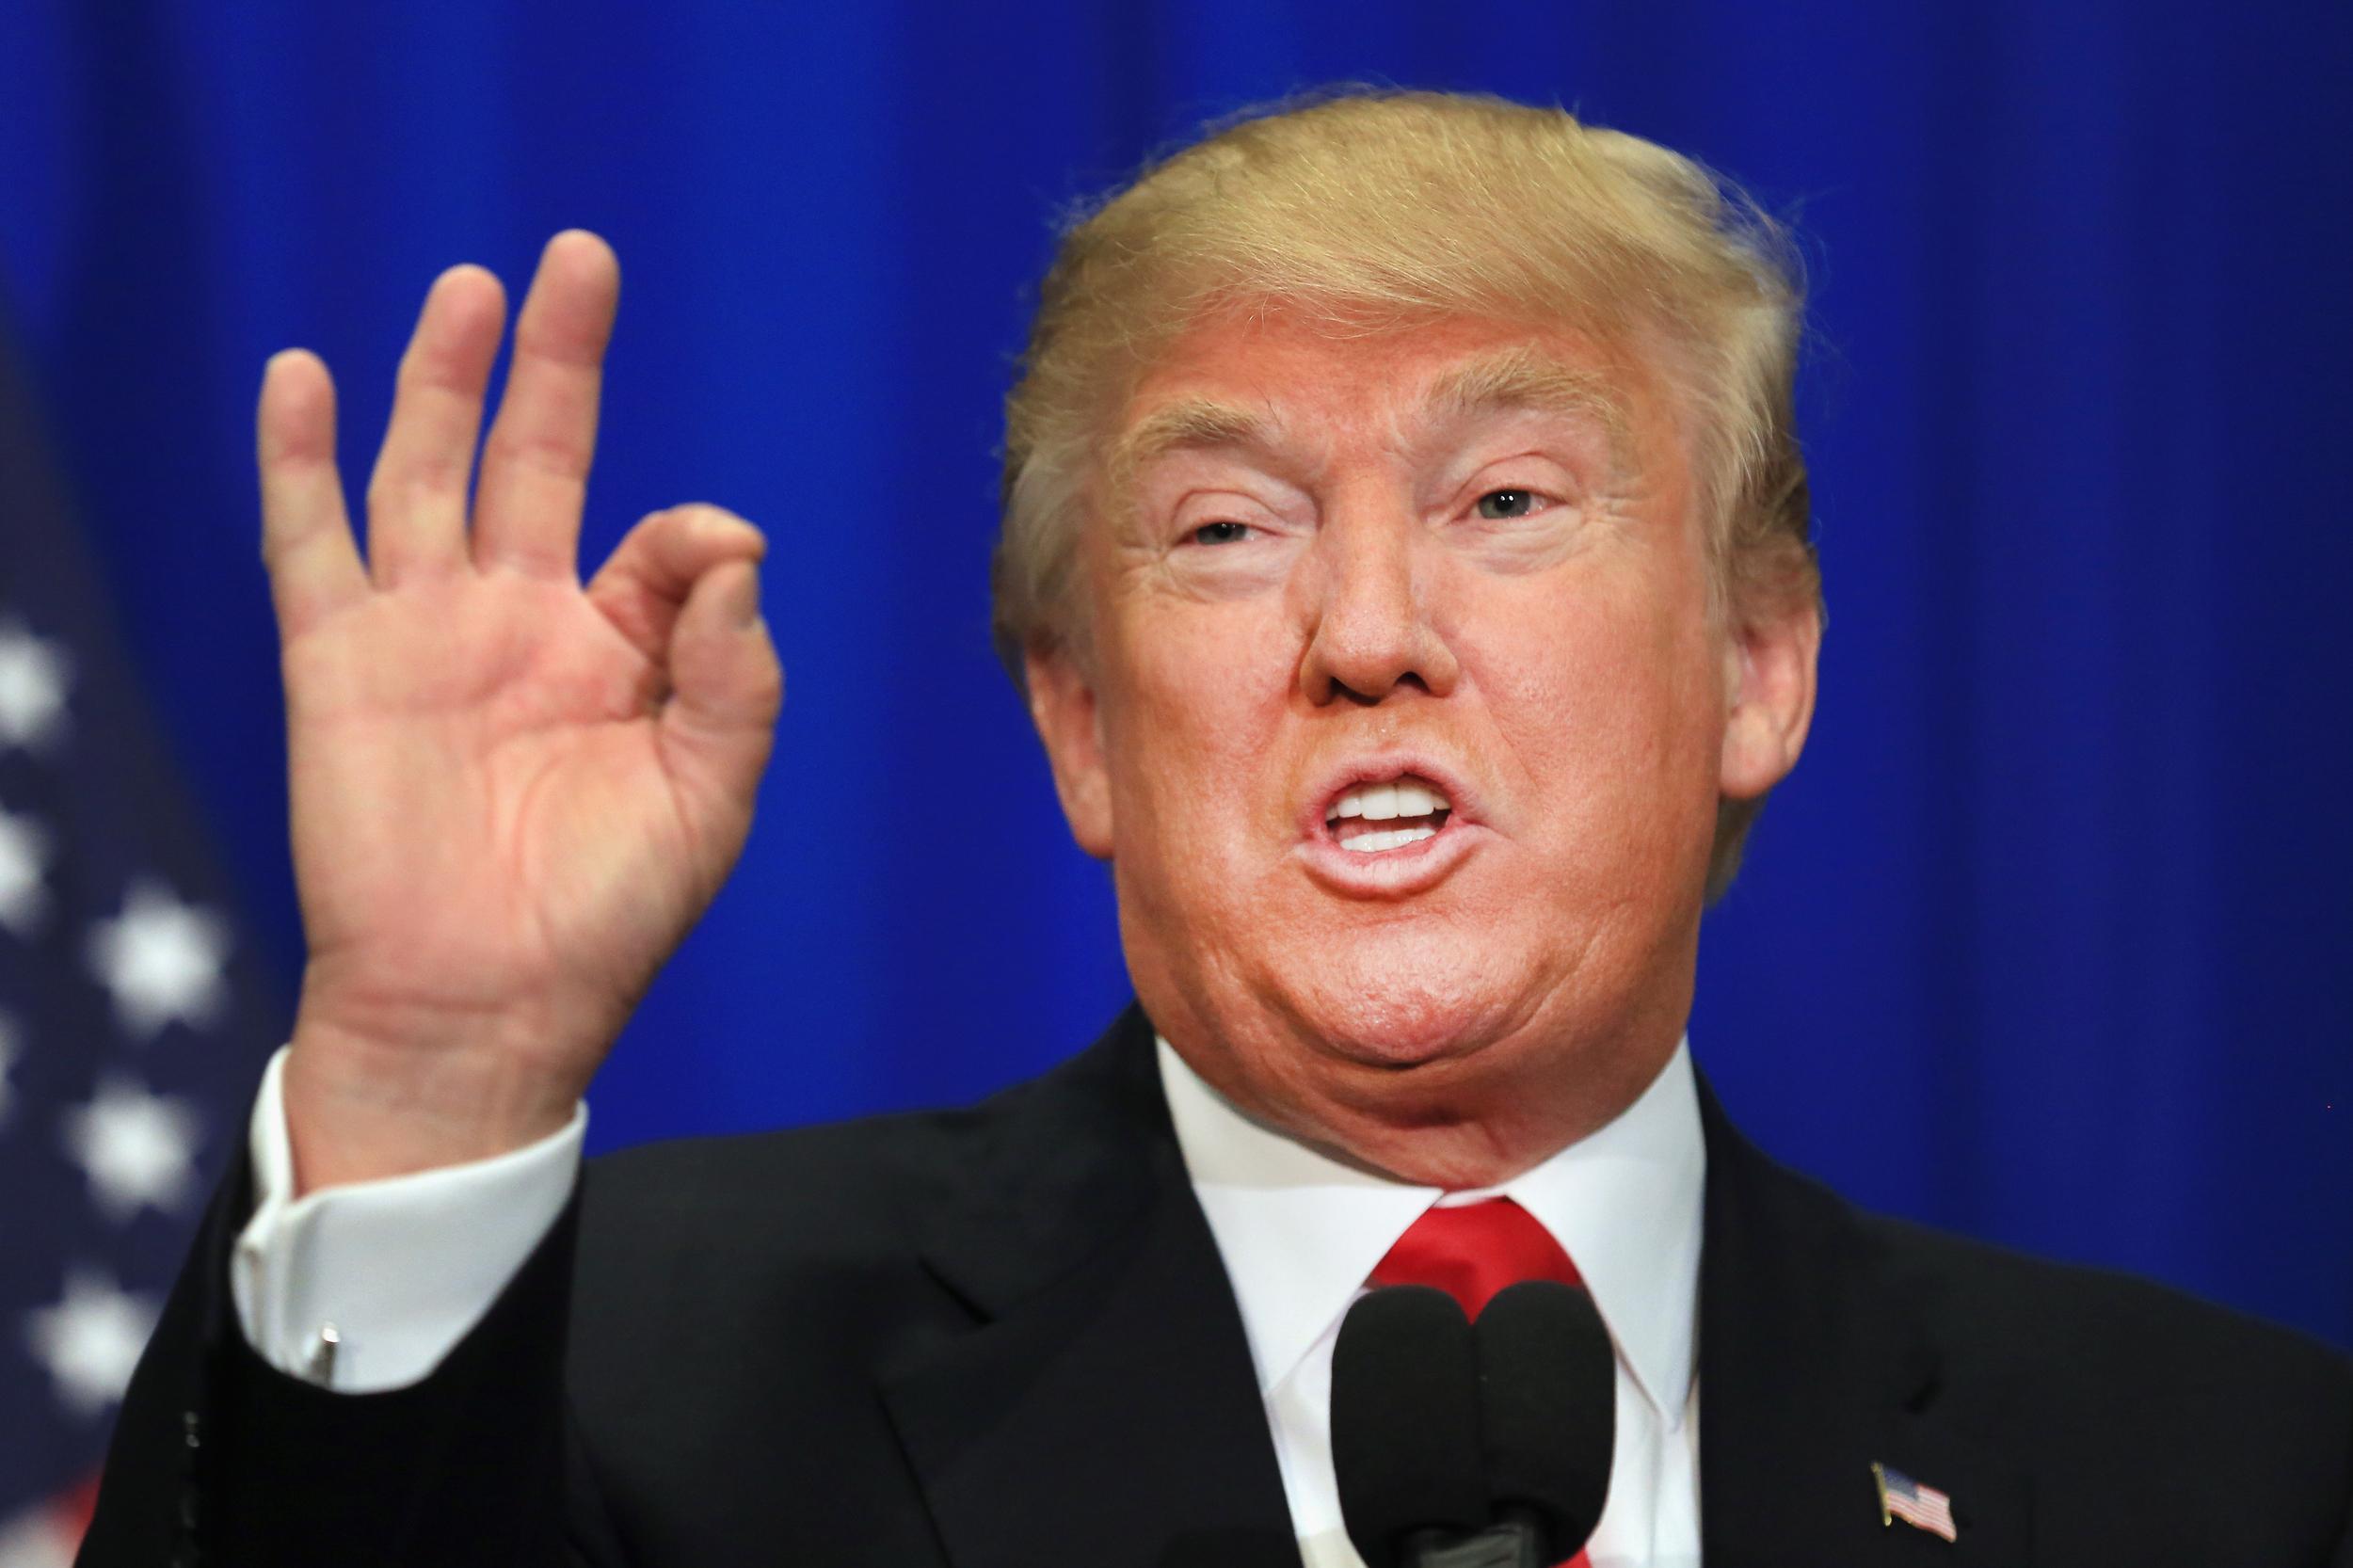 Gollum personifica a Donald Trump